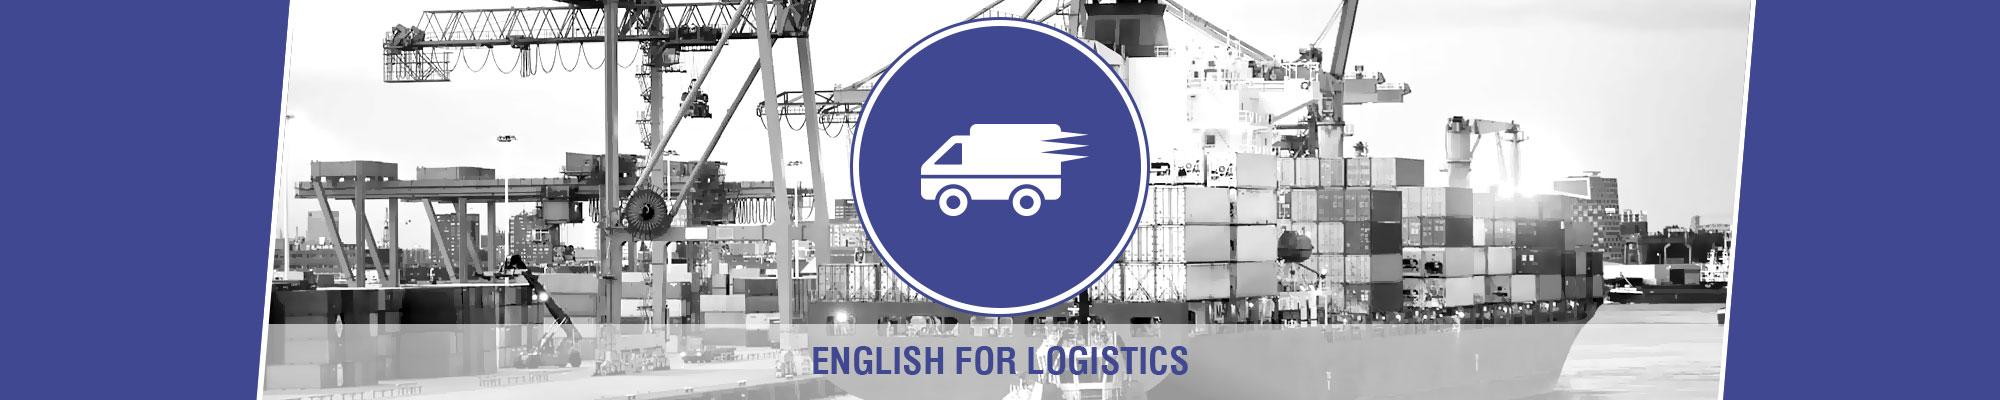 Anglokom Corporate Language Training Bangkok - English for Logistics